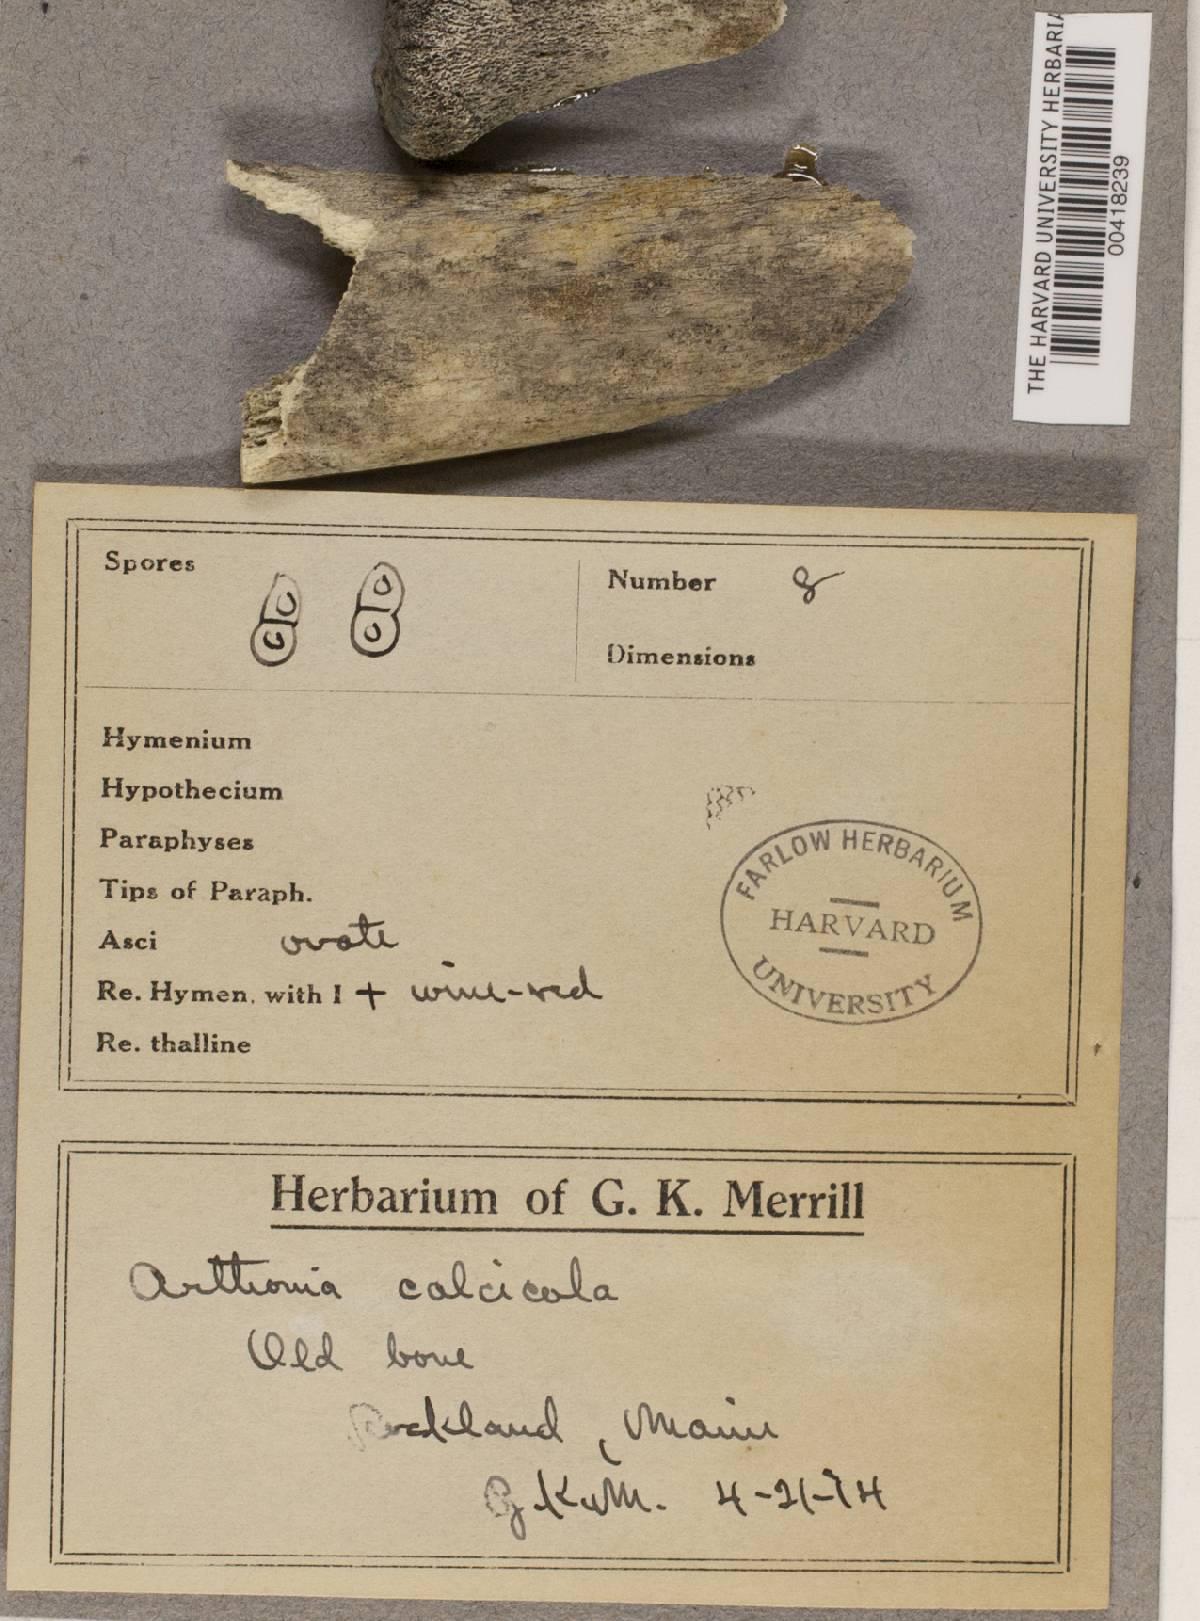 Arthonia calcicola image